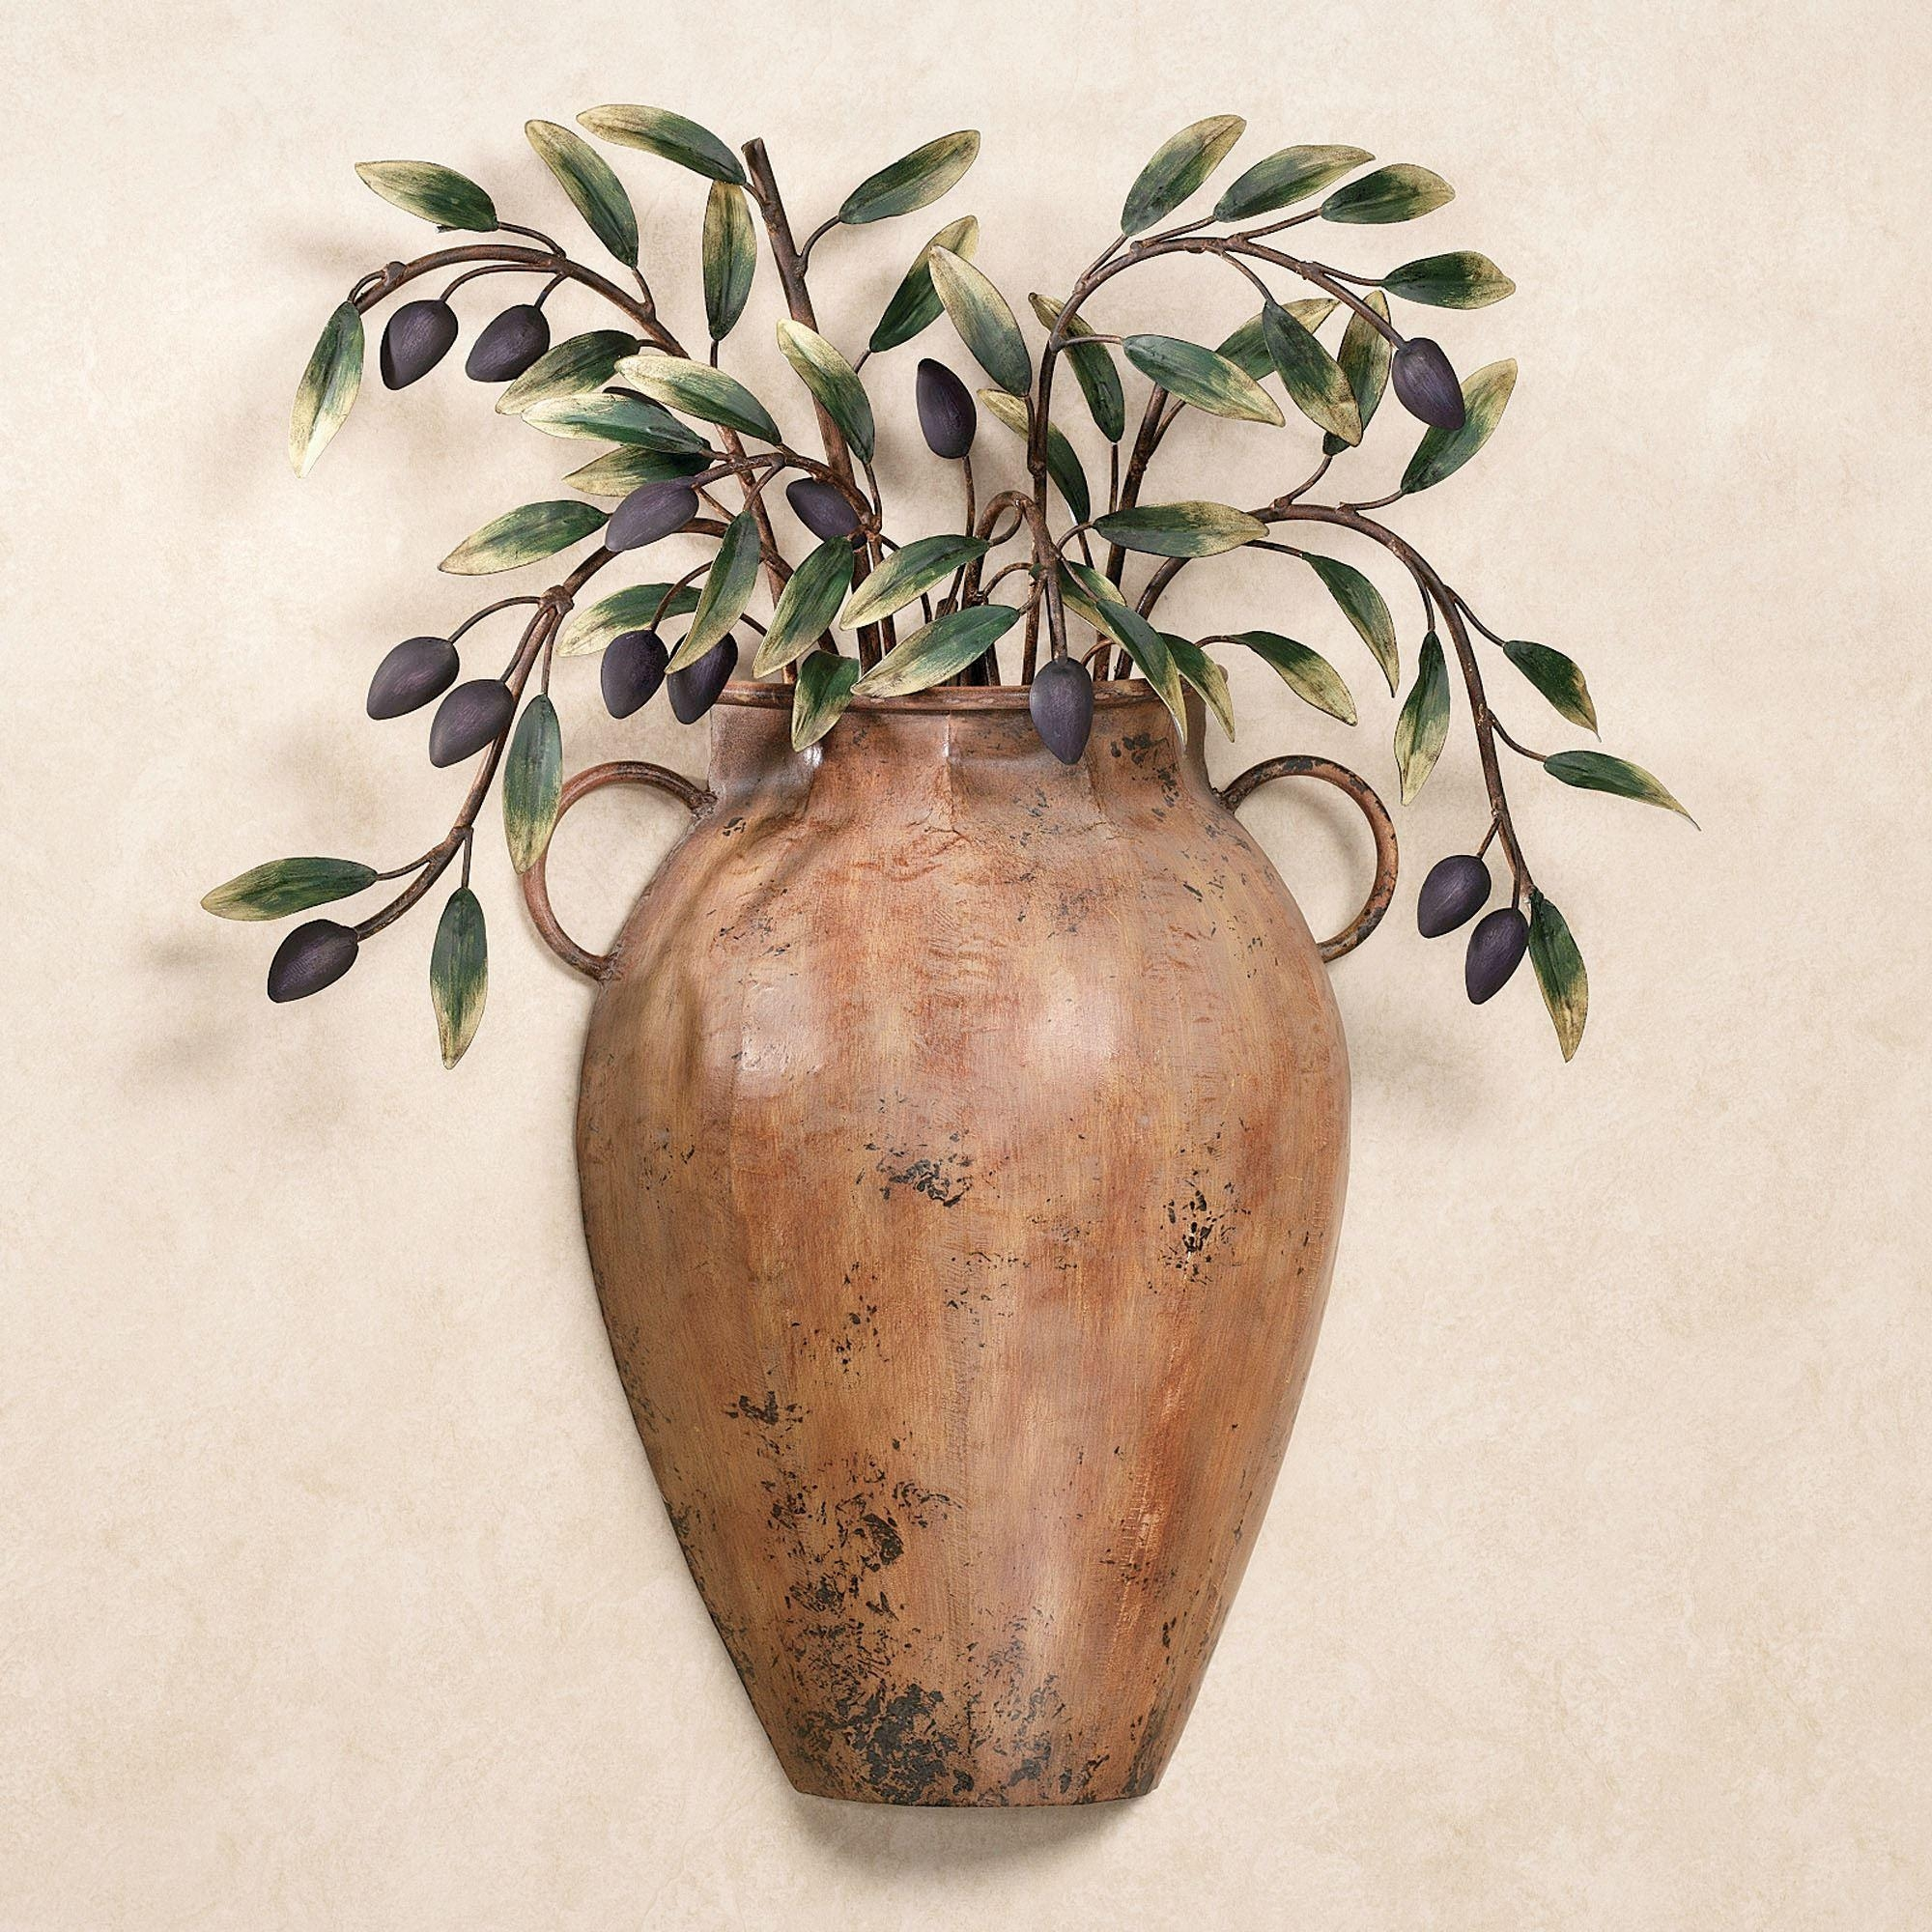 Tuscan Italian Art | Touch Of Class Regarding Italian Ceramic Outdoor Wall Art (Image 20 of 20)